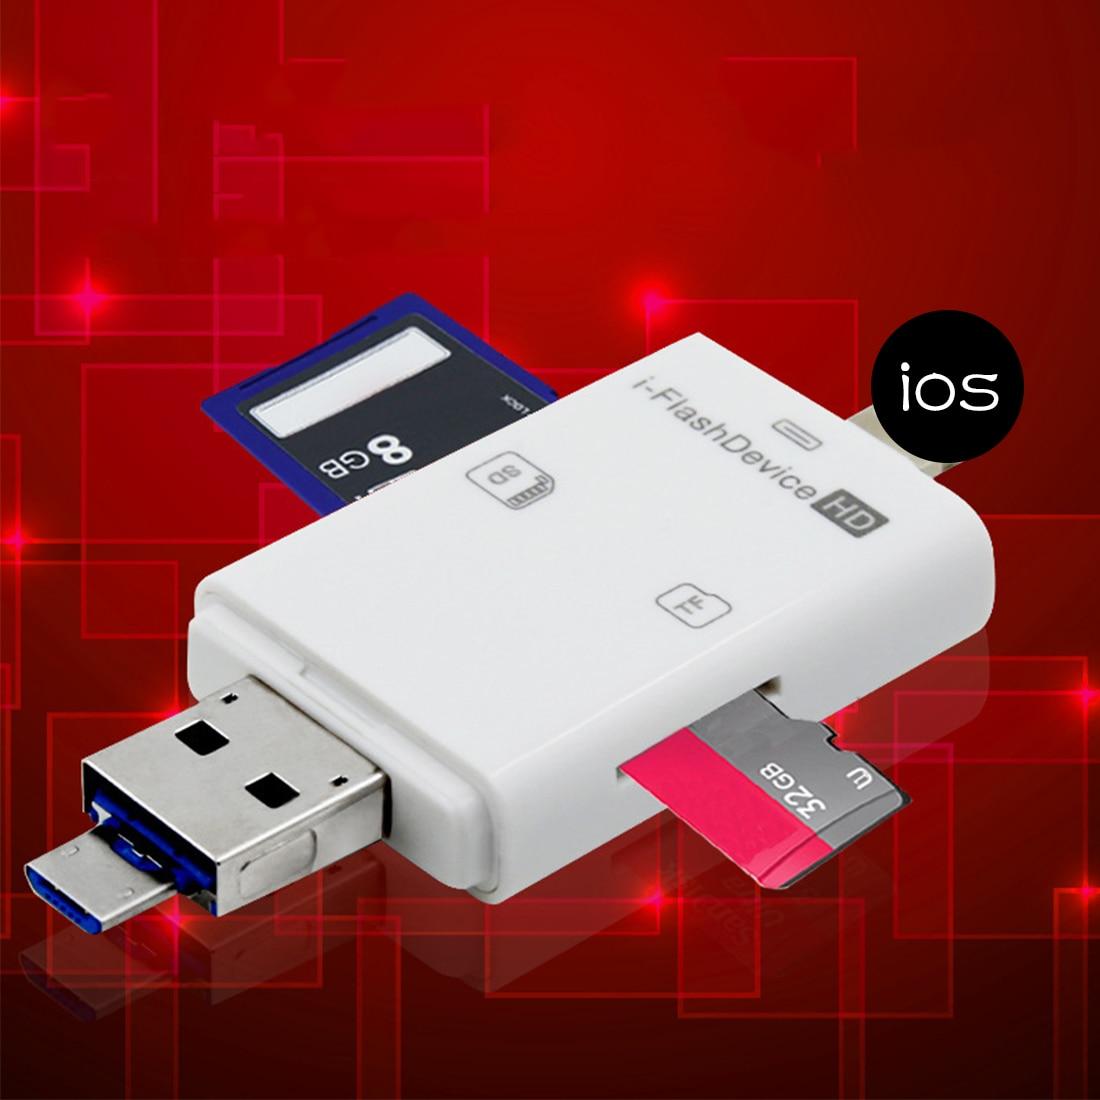 NOYOKERE 3in1 Micro USB Reader Micro SD SDHC TF SD karte Für iPhone 5/5 s/6/6 7 plus/ipad pro air/Samsung/LG/HTC Andrid OTG handys